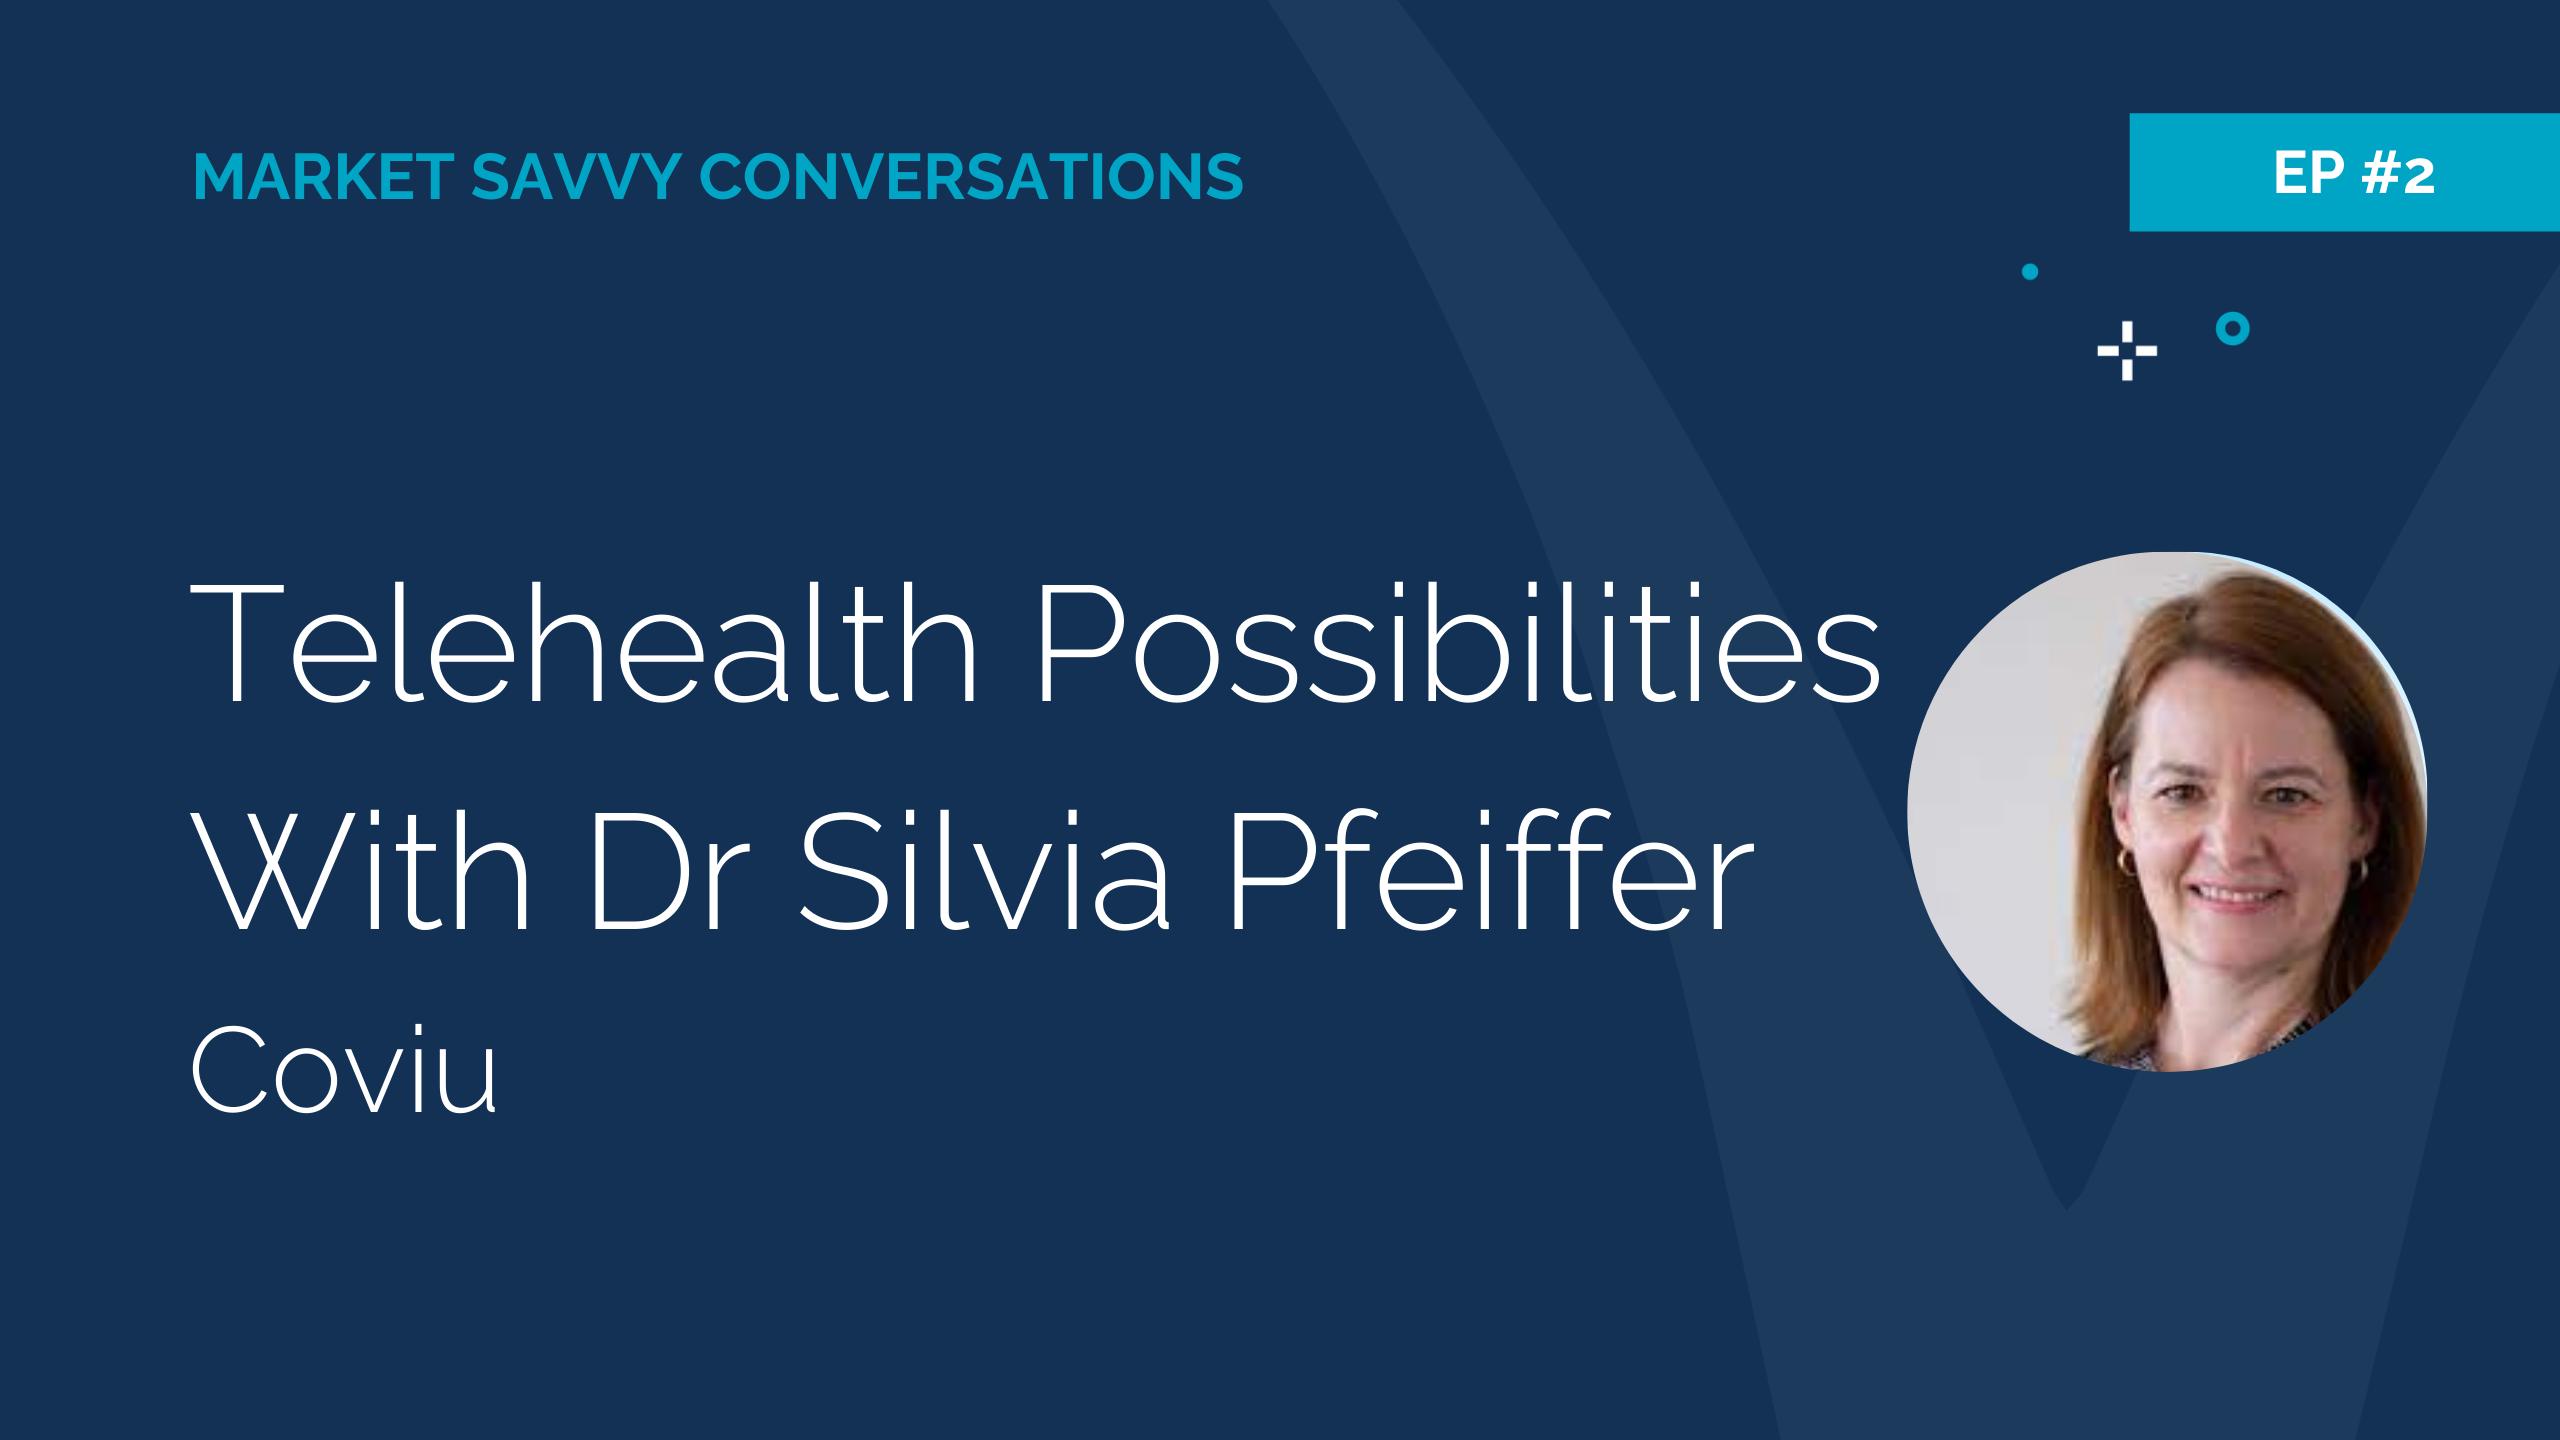 Megan Walker Interviews Silvia Pfeiffer - Telehealth Possibilities